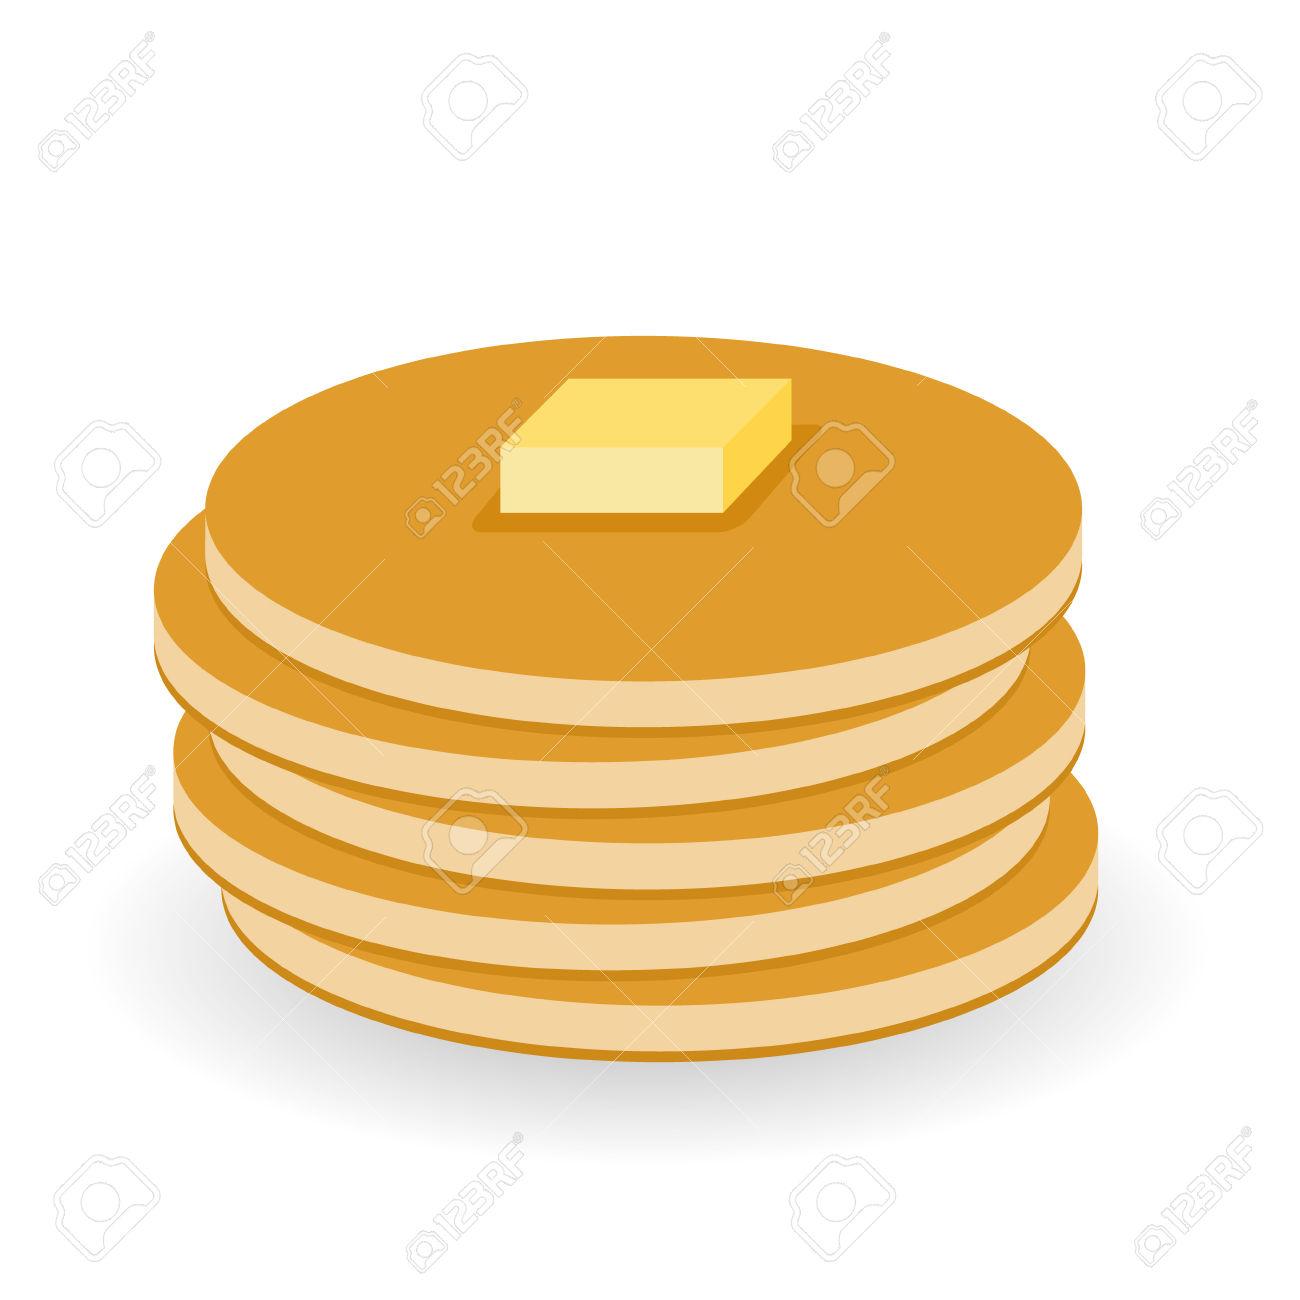 Pancake clipart #20157 Pancake Savoronmorehead com Best